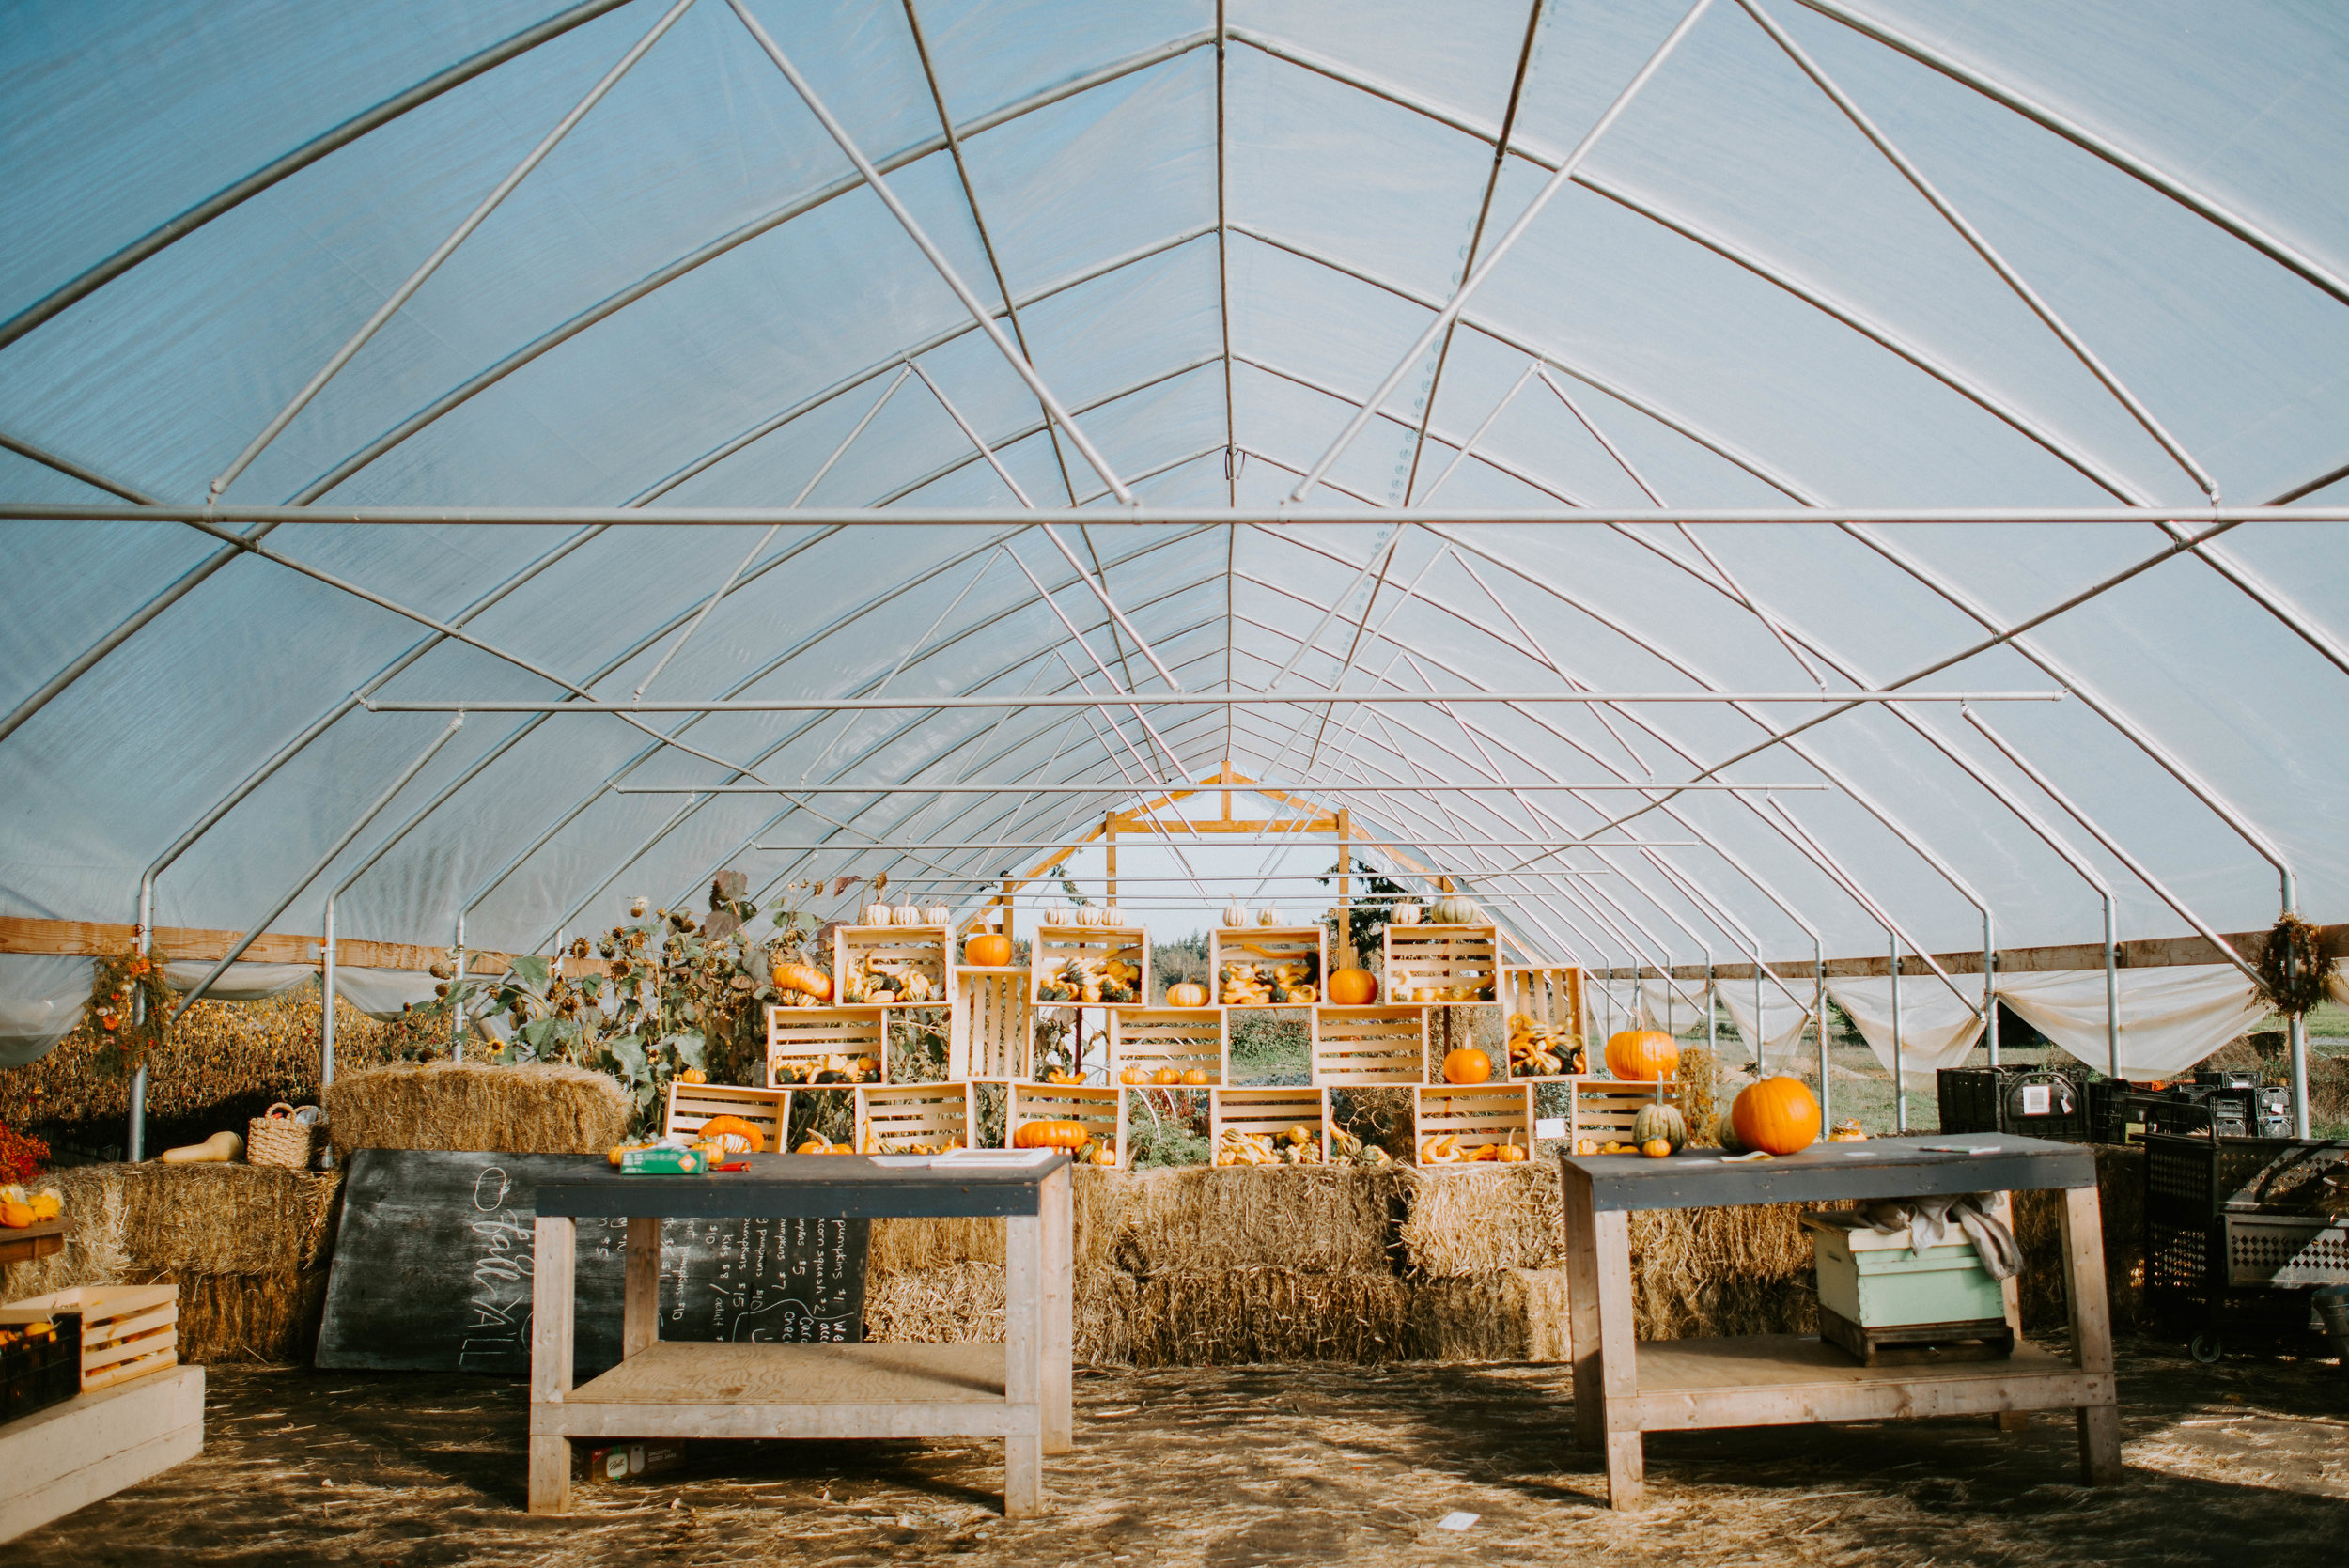 Triple Wren Farms Pumpkin Patch